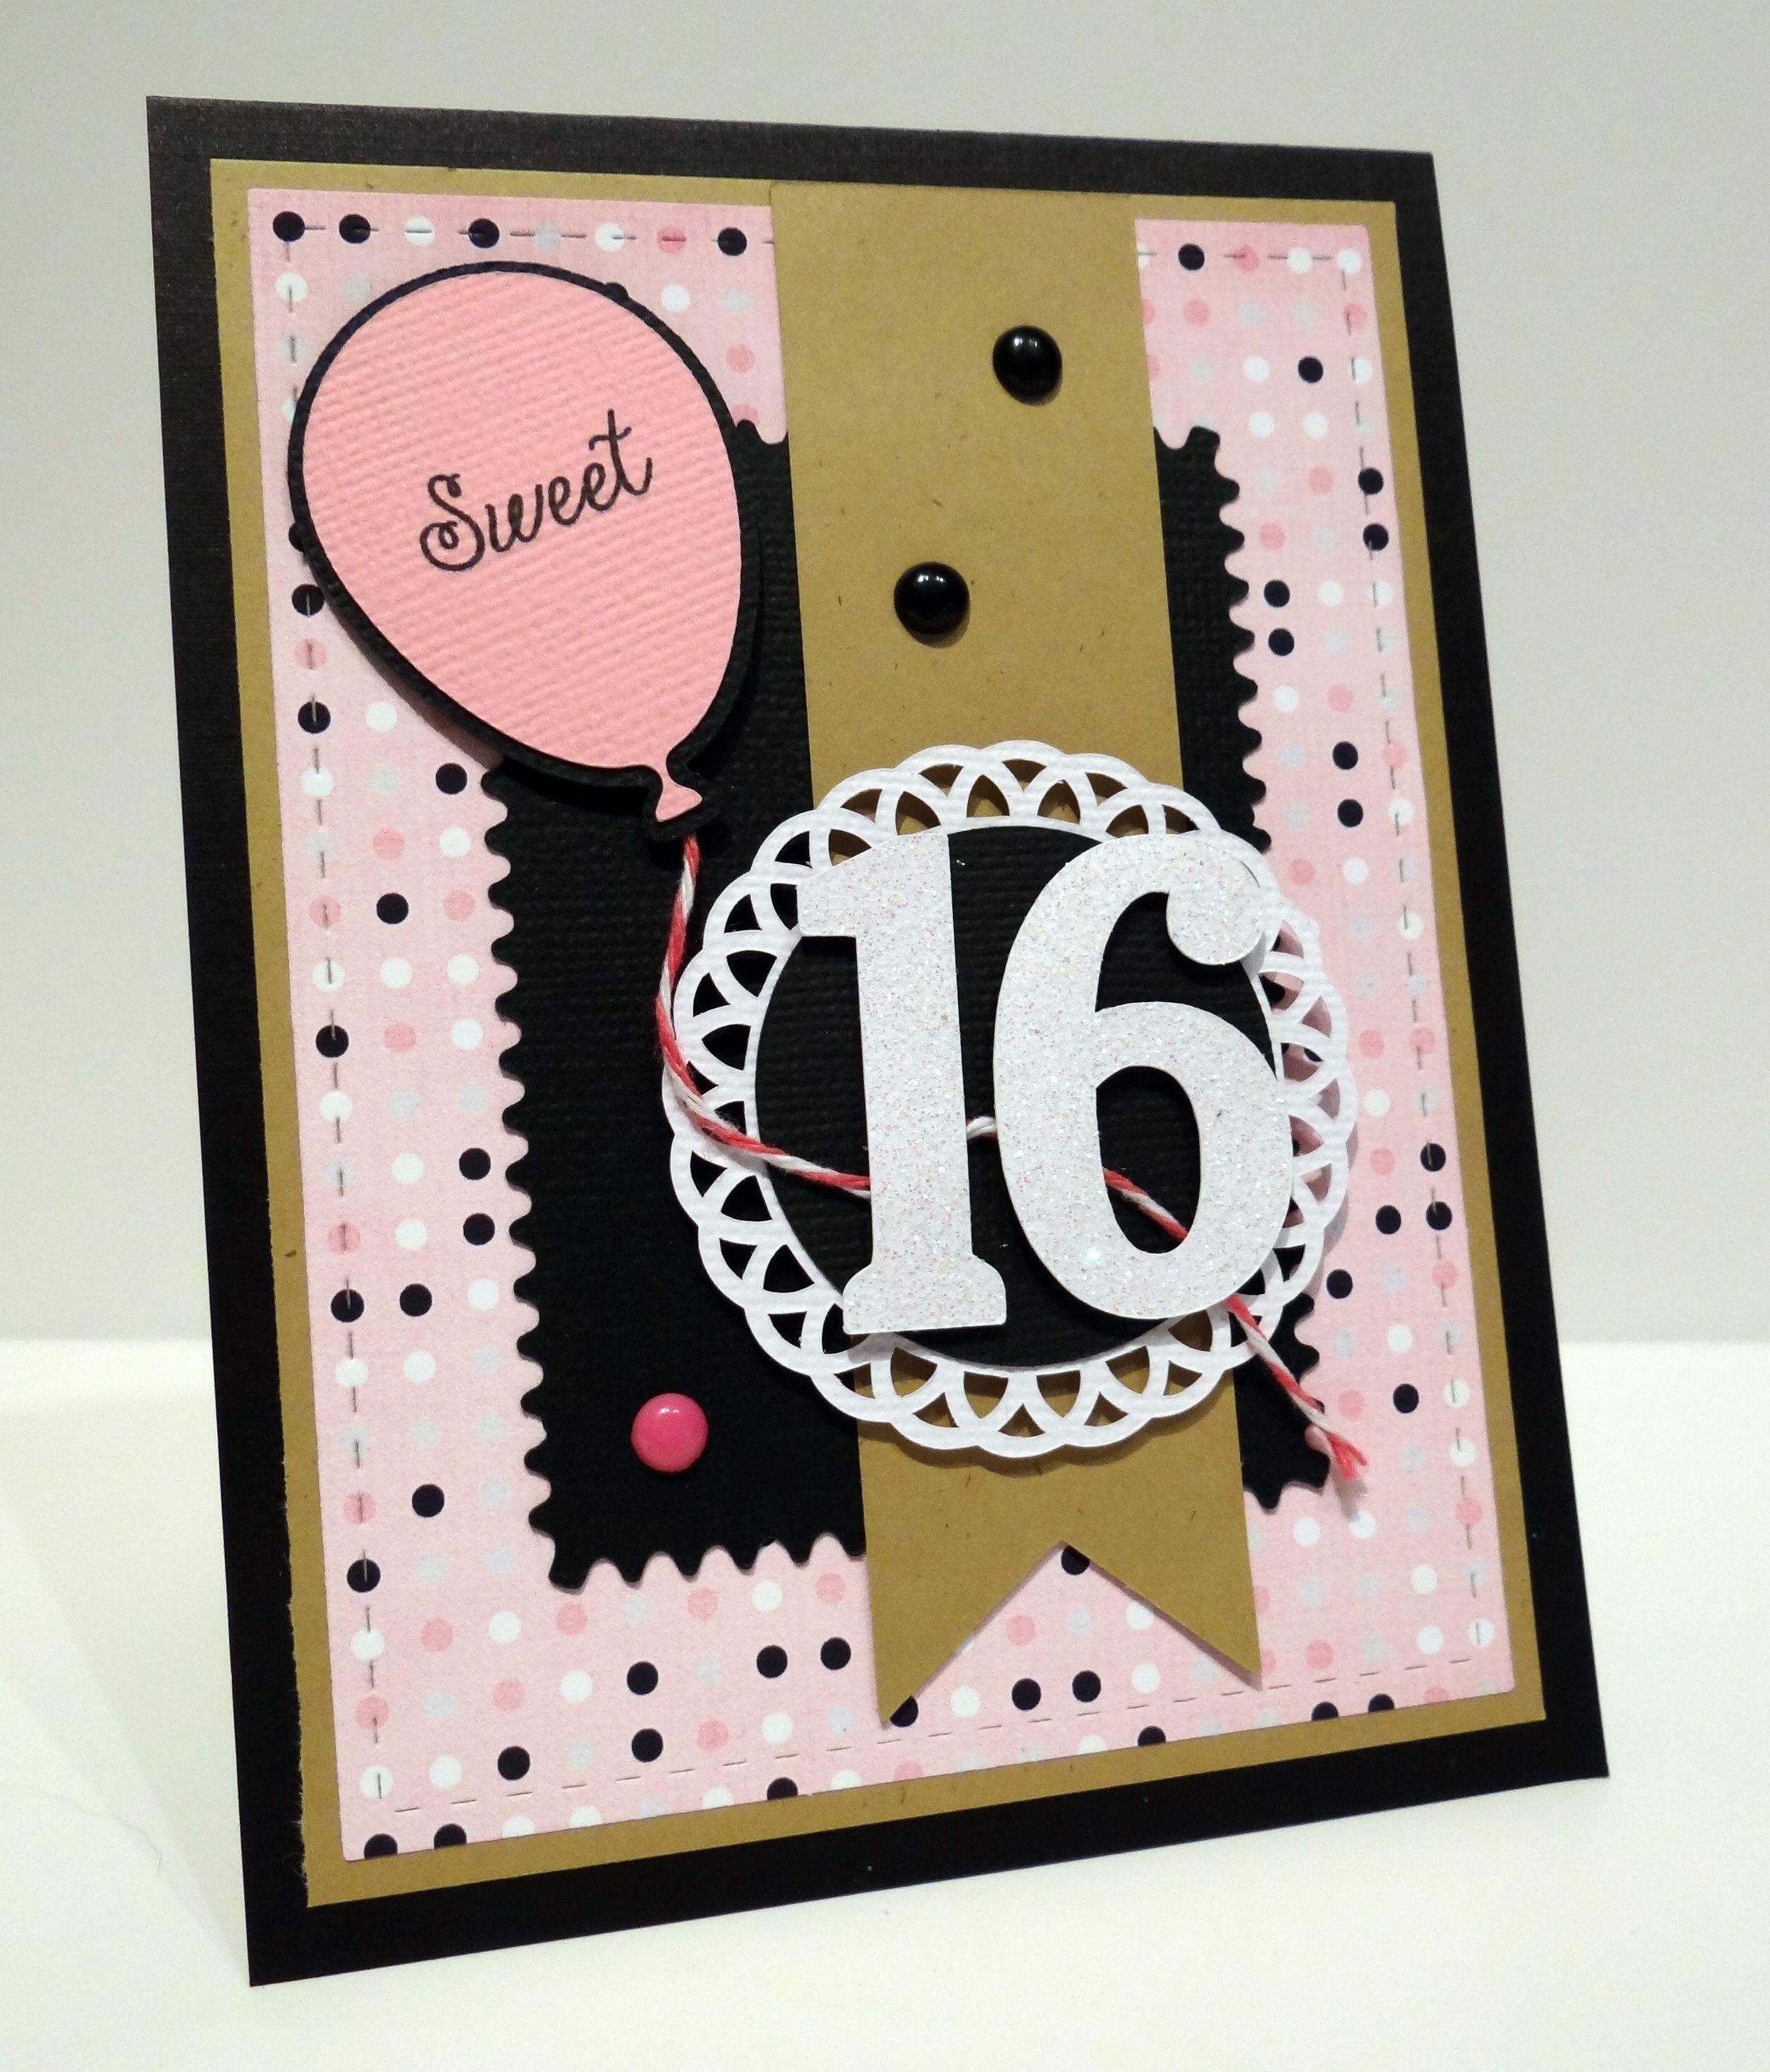 Sweet 16 16th Birthday Card Card Making Birthday Birthday Cards